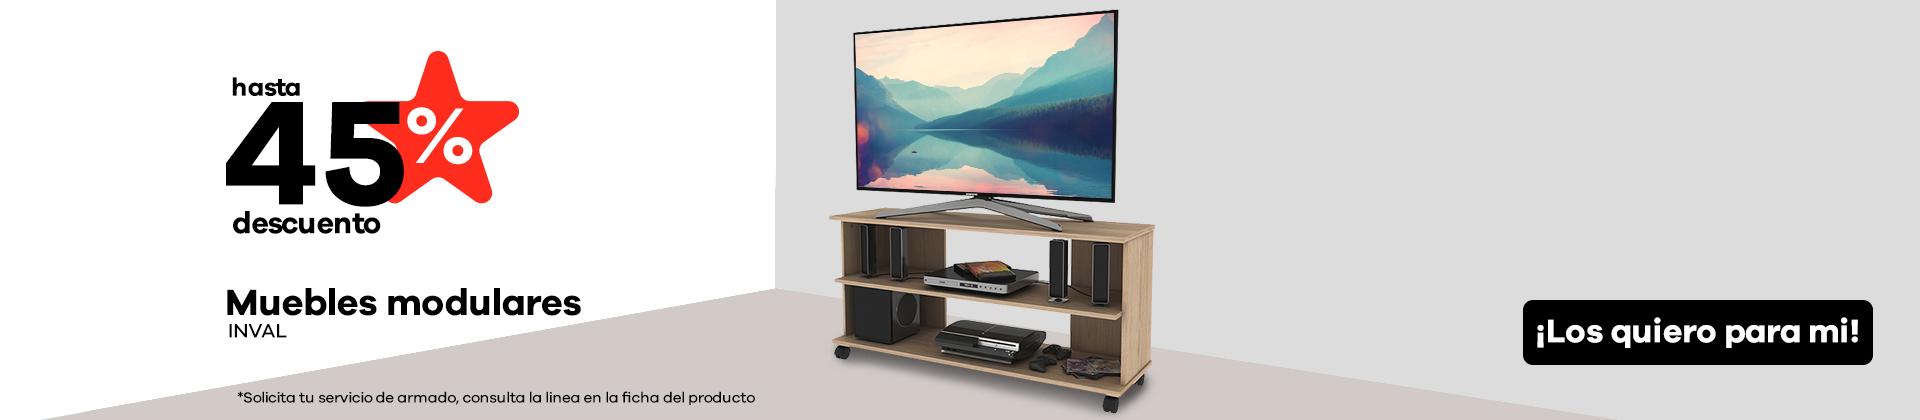 muebles-modulares-inval